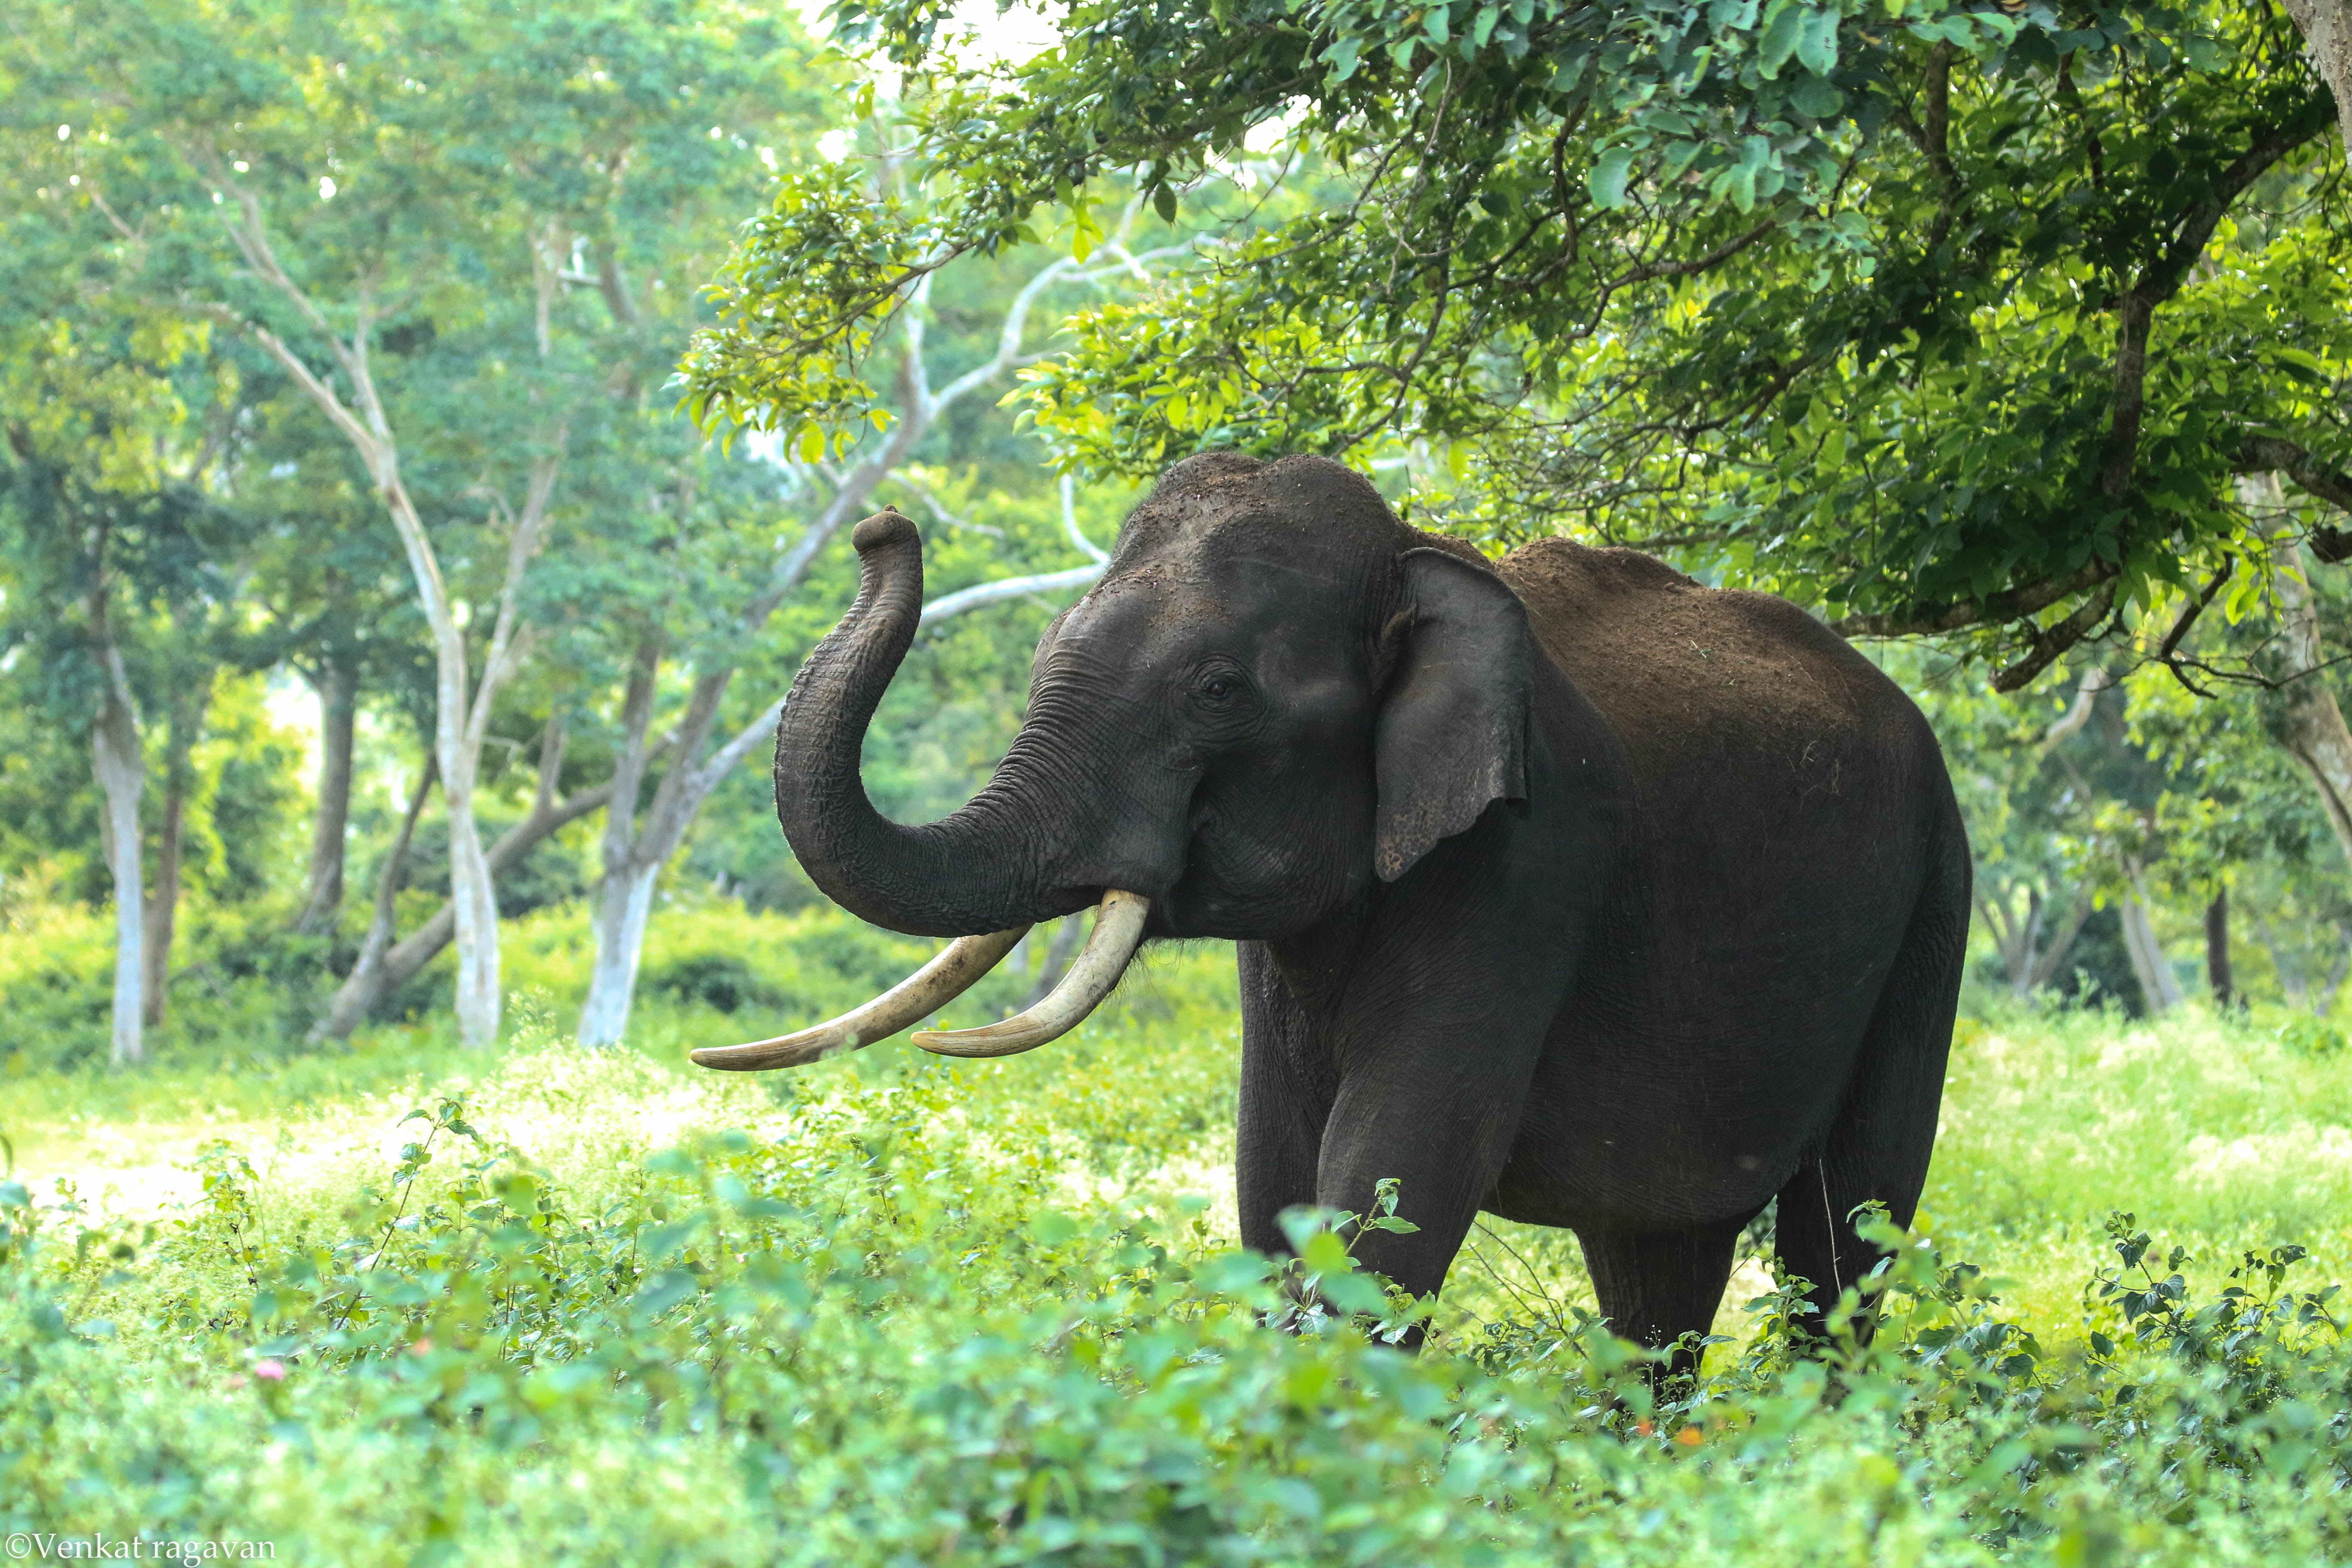 Black Elephant Near Trees